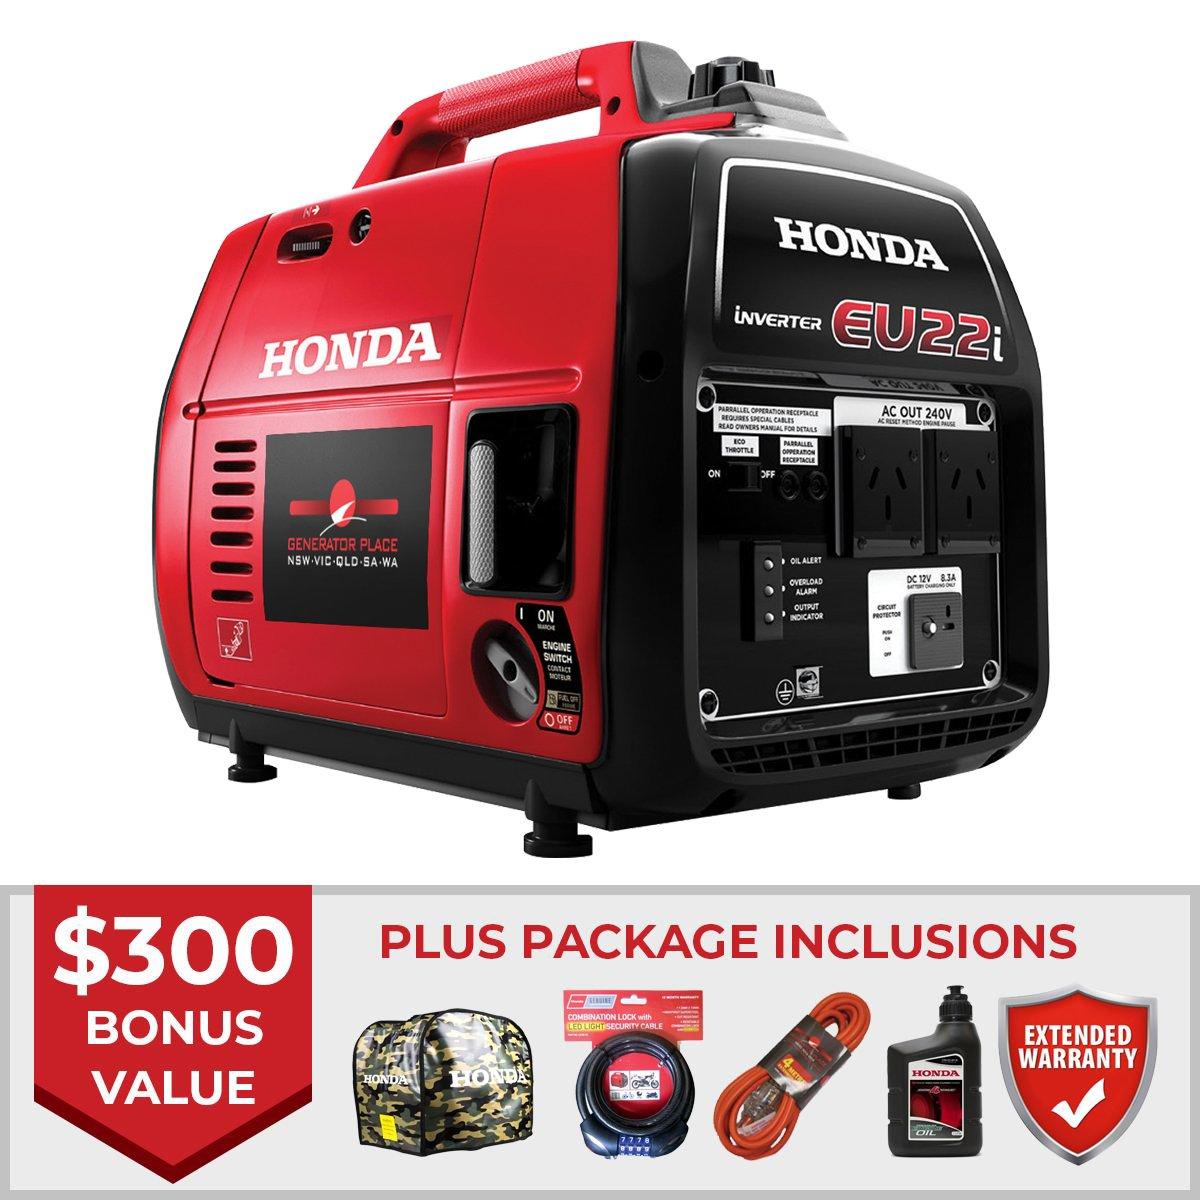 Chwalebne 1 Honda Generator Dealer in Australia | Generator Place - Free NJ08